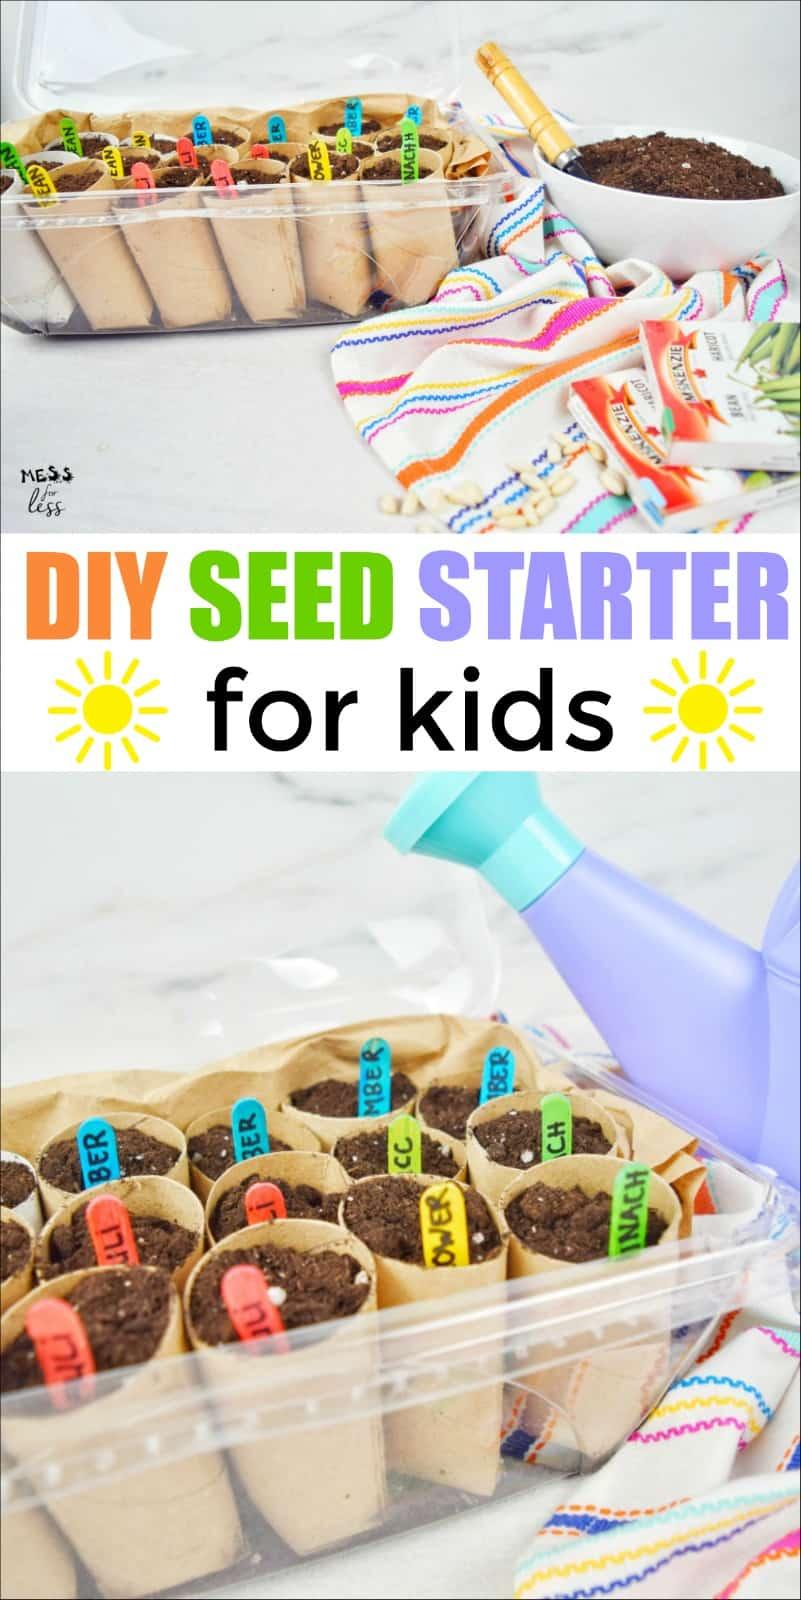 DIY Seed Starter for Kids